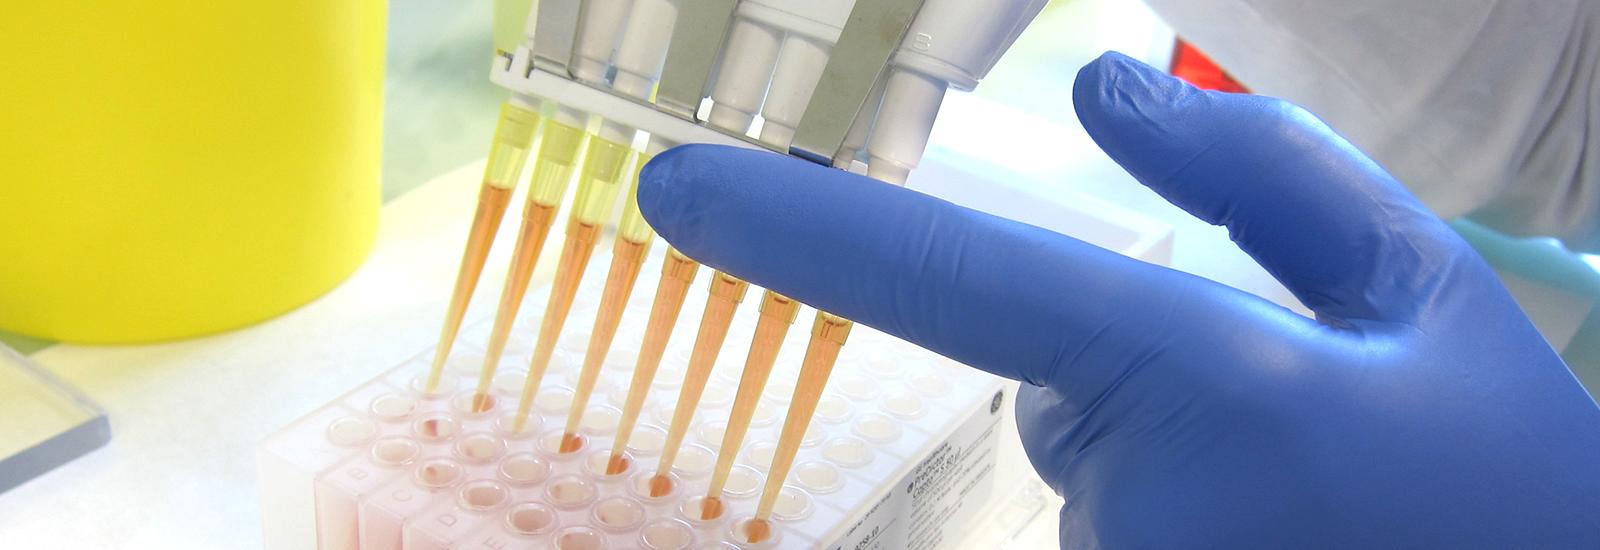 formation continue biotechnologie bordeaux aquitaine